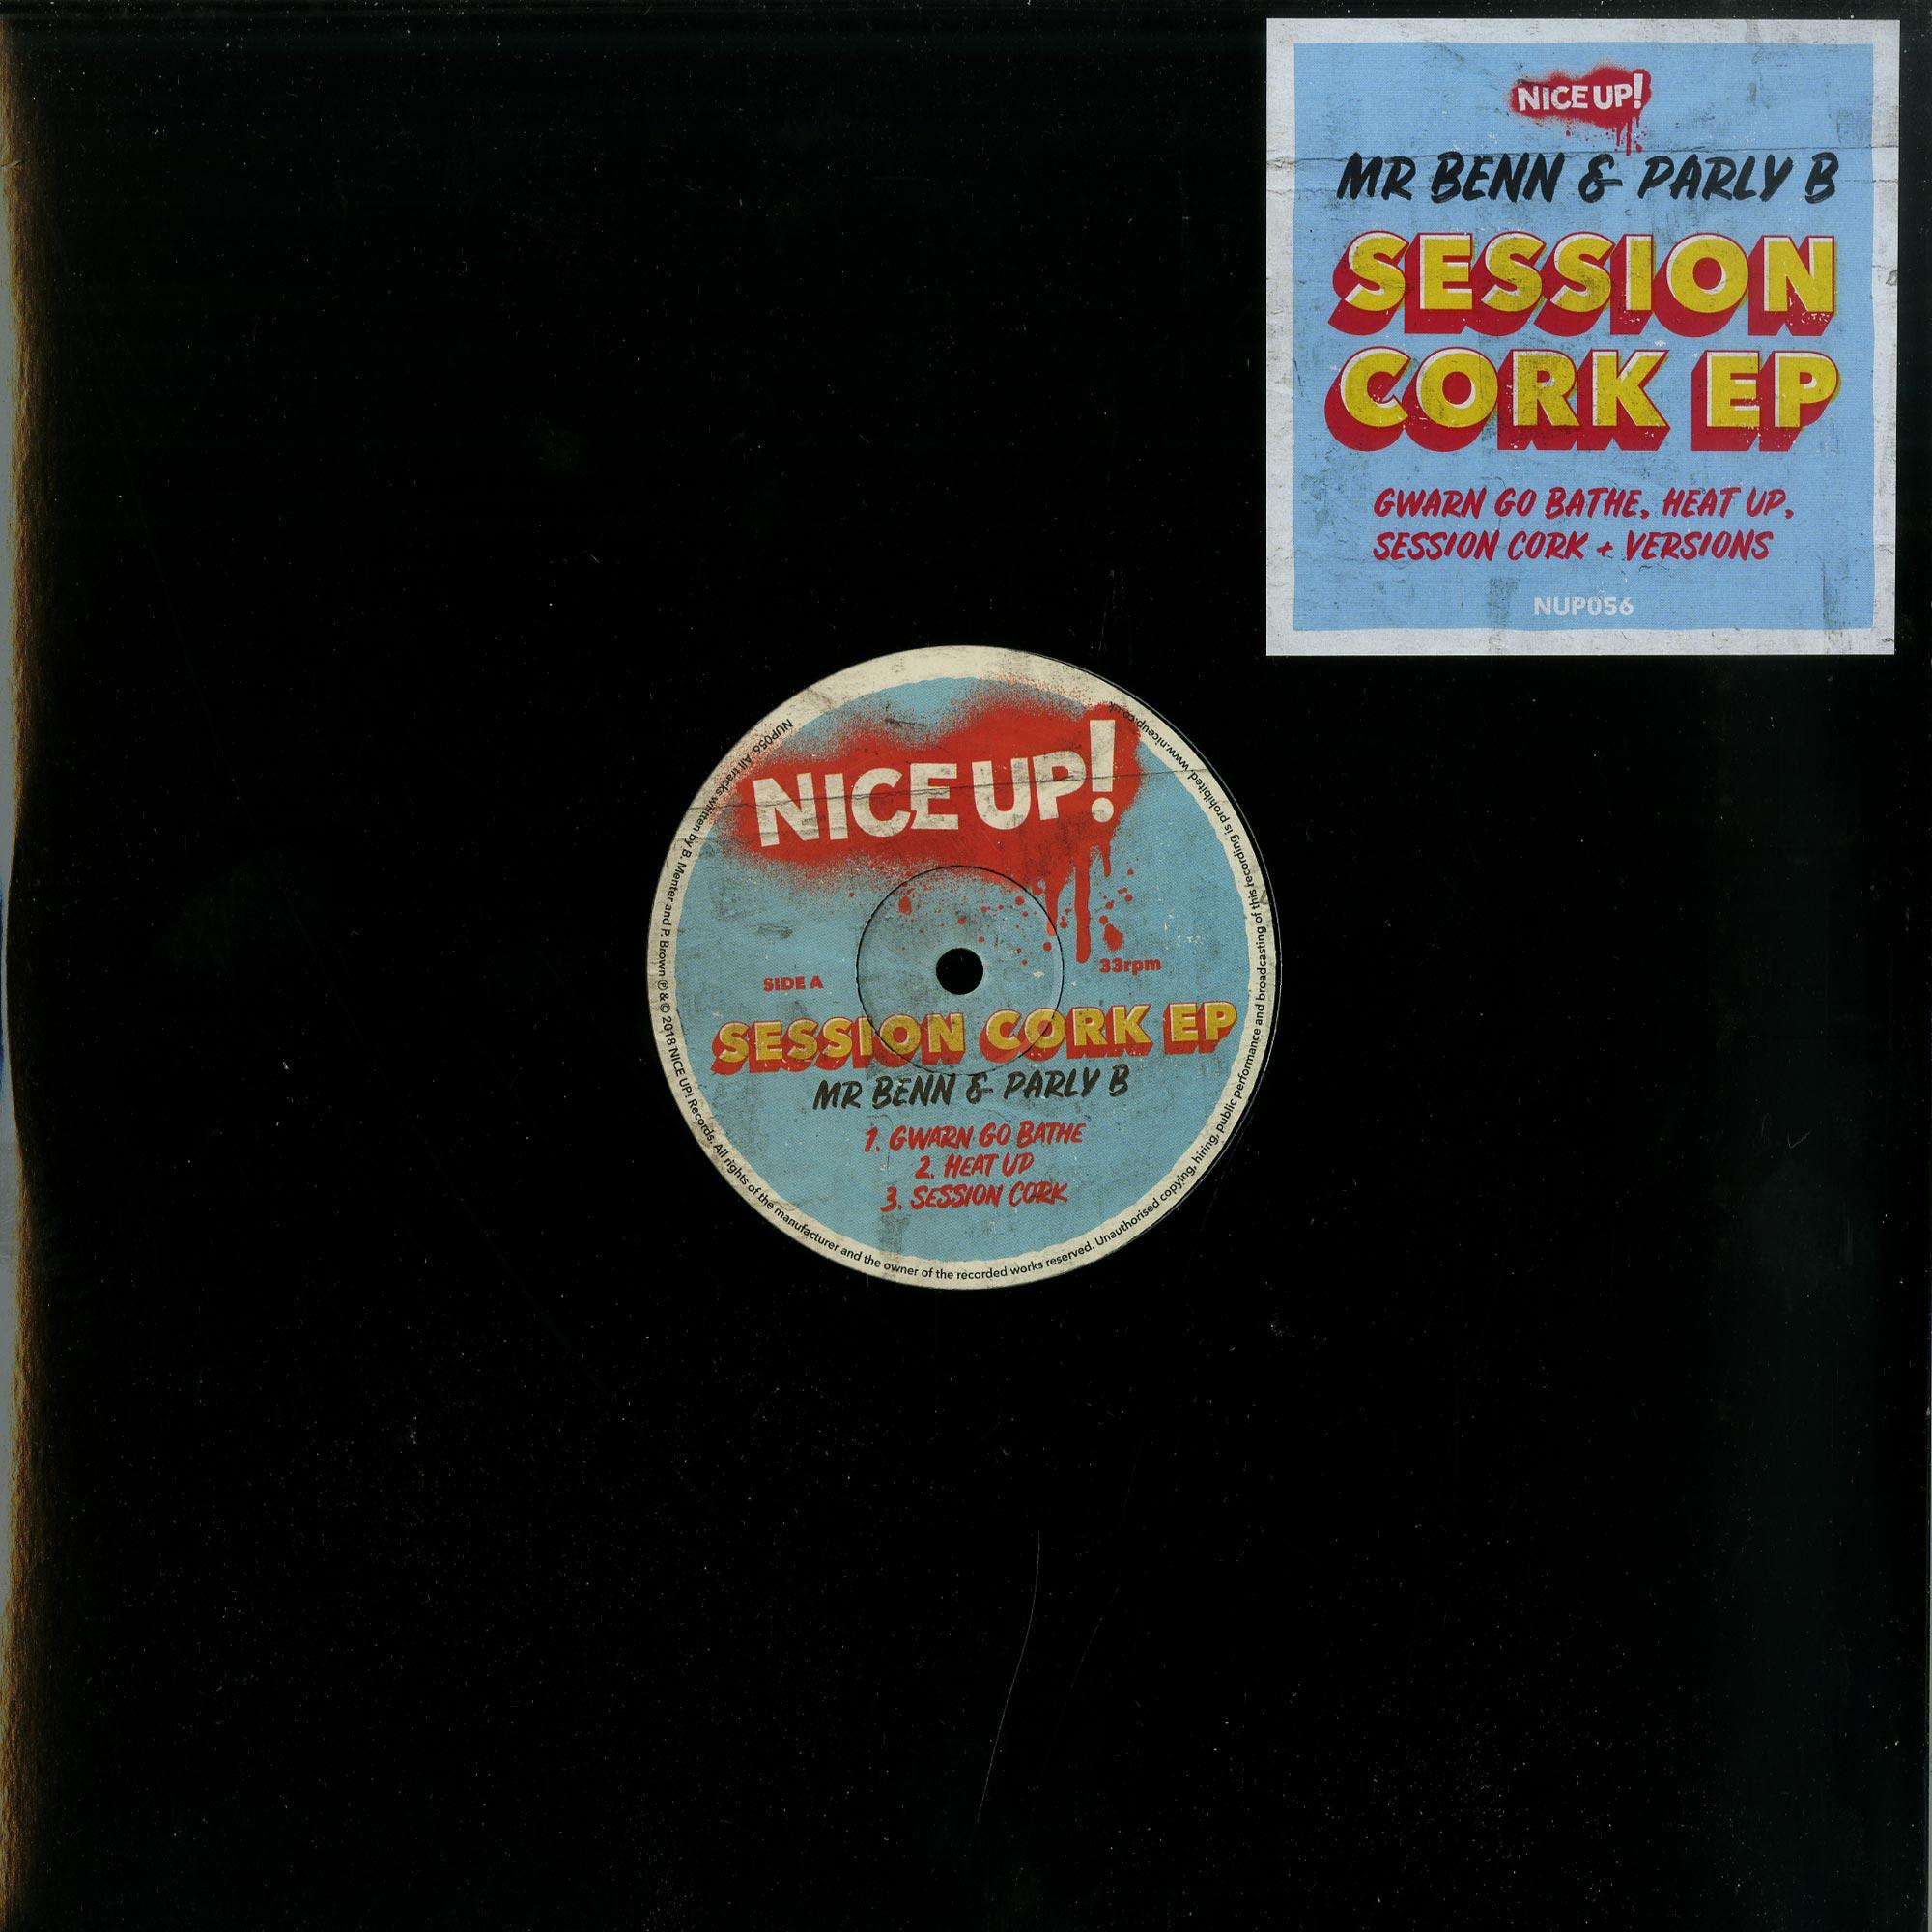 Mr Benn & Parly B - SESSION CORK EP